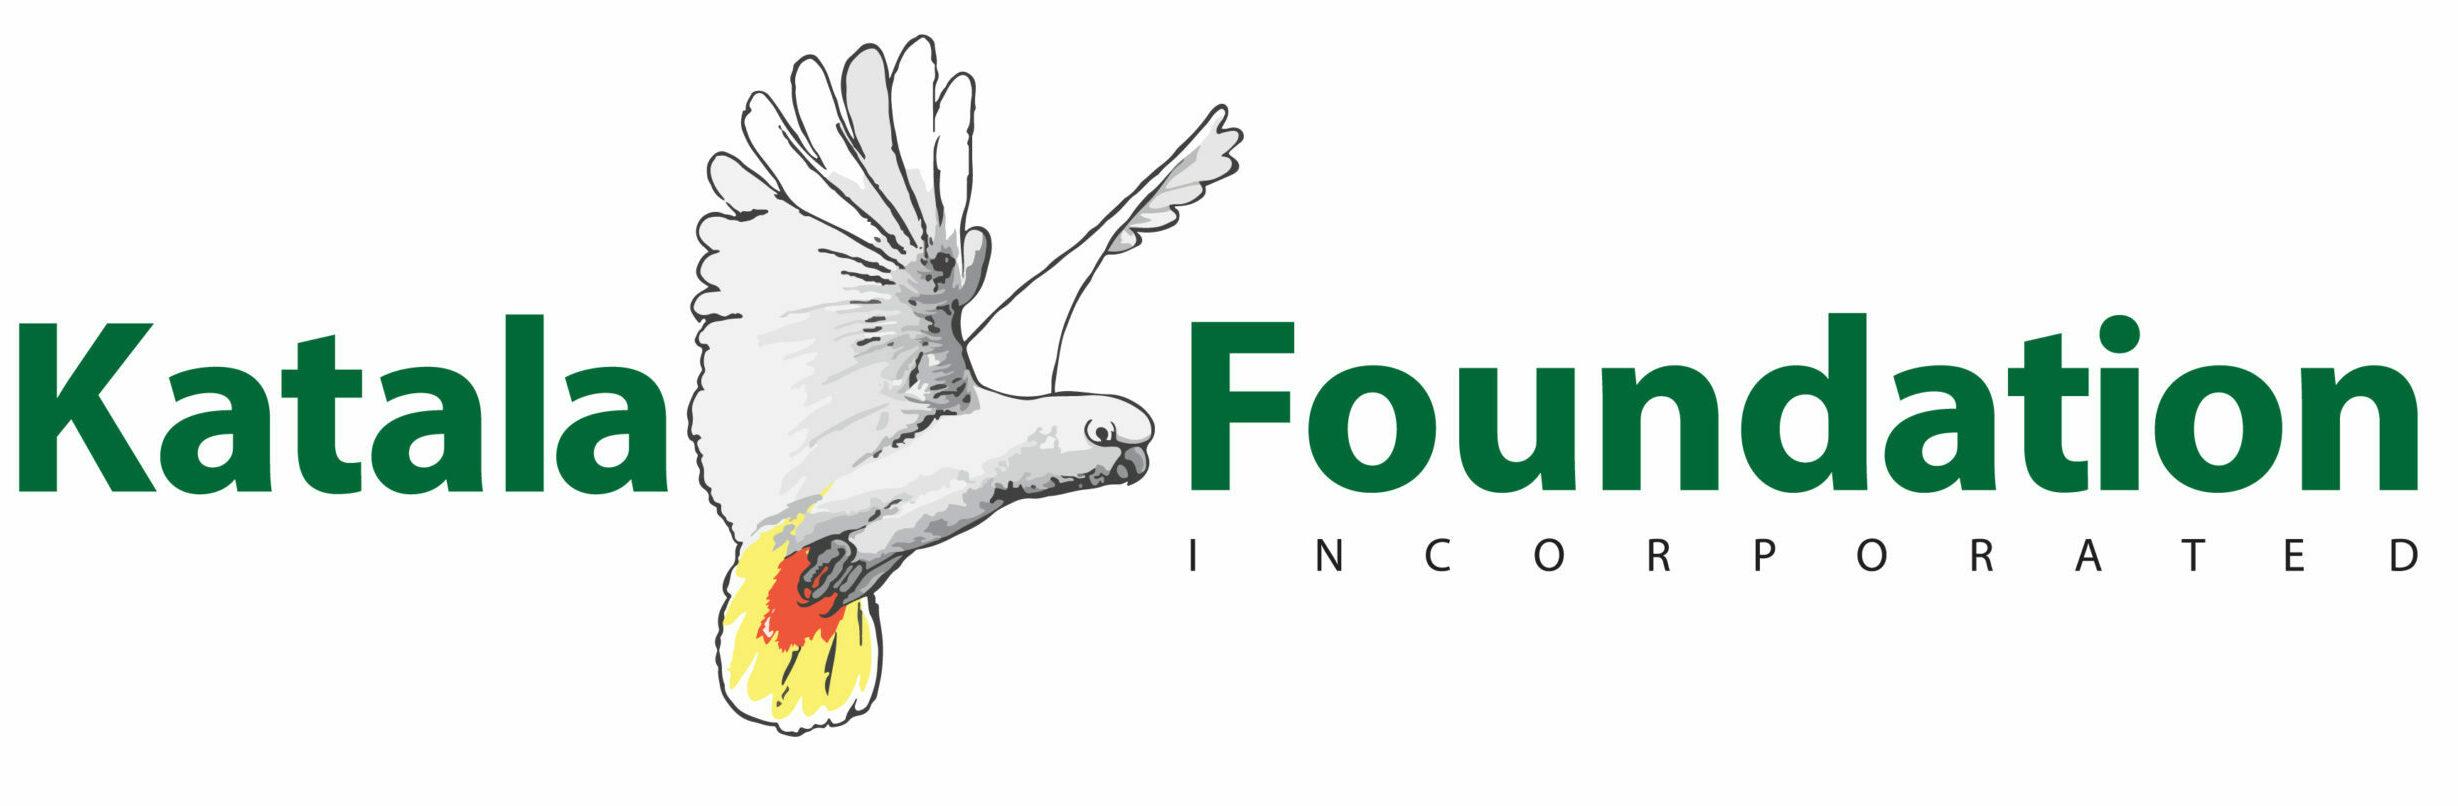 cropped-KFI-Logo-HORIZONTALFINAL-2-scaled-e1631865613937.jpg